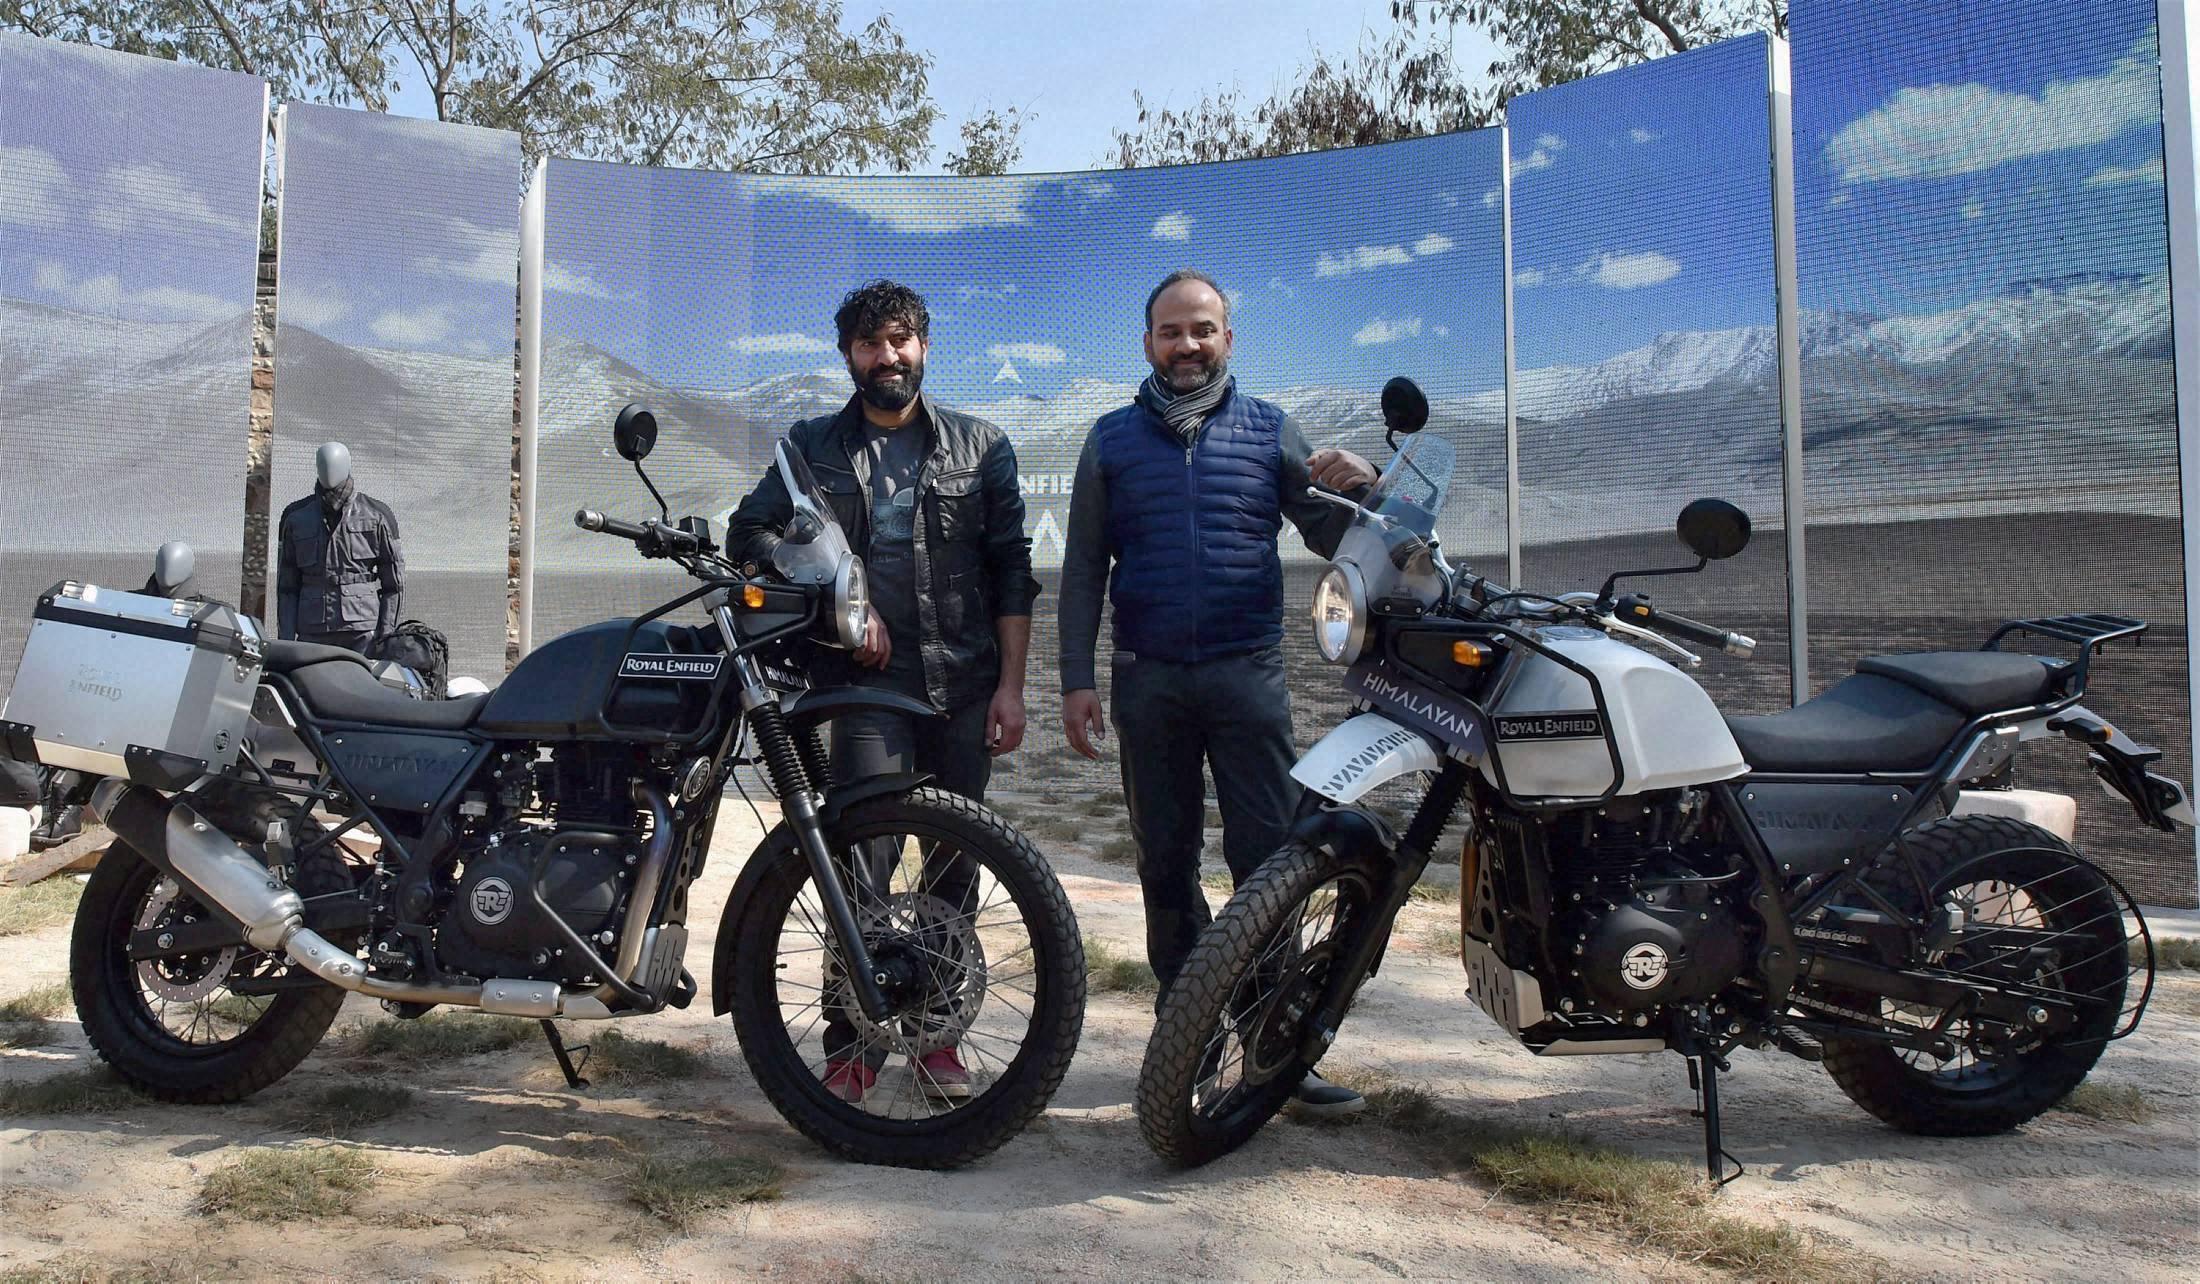 Moto expo 2016 royal enfield at the launch of himalayan